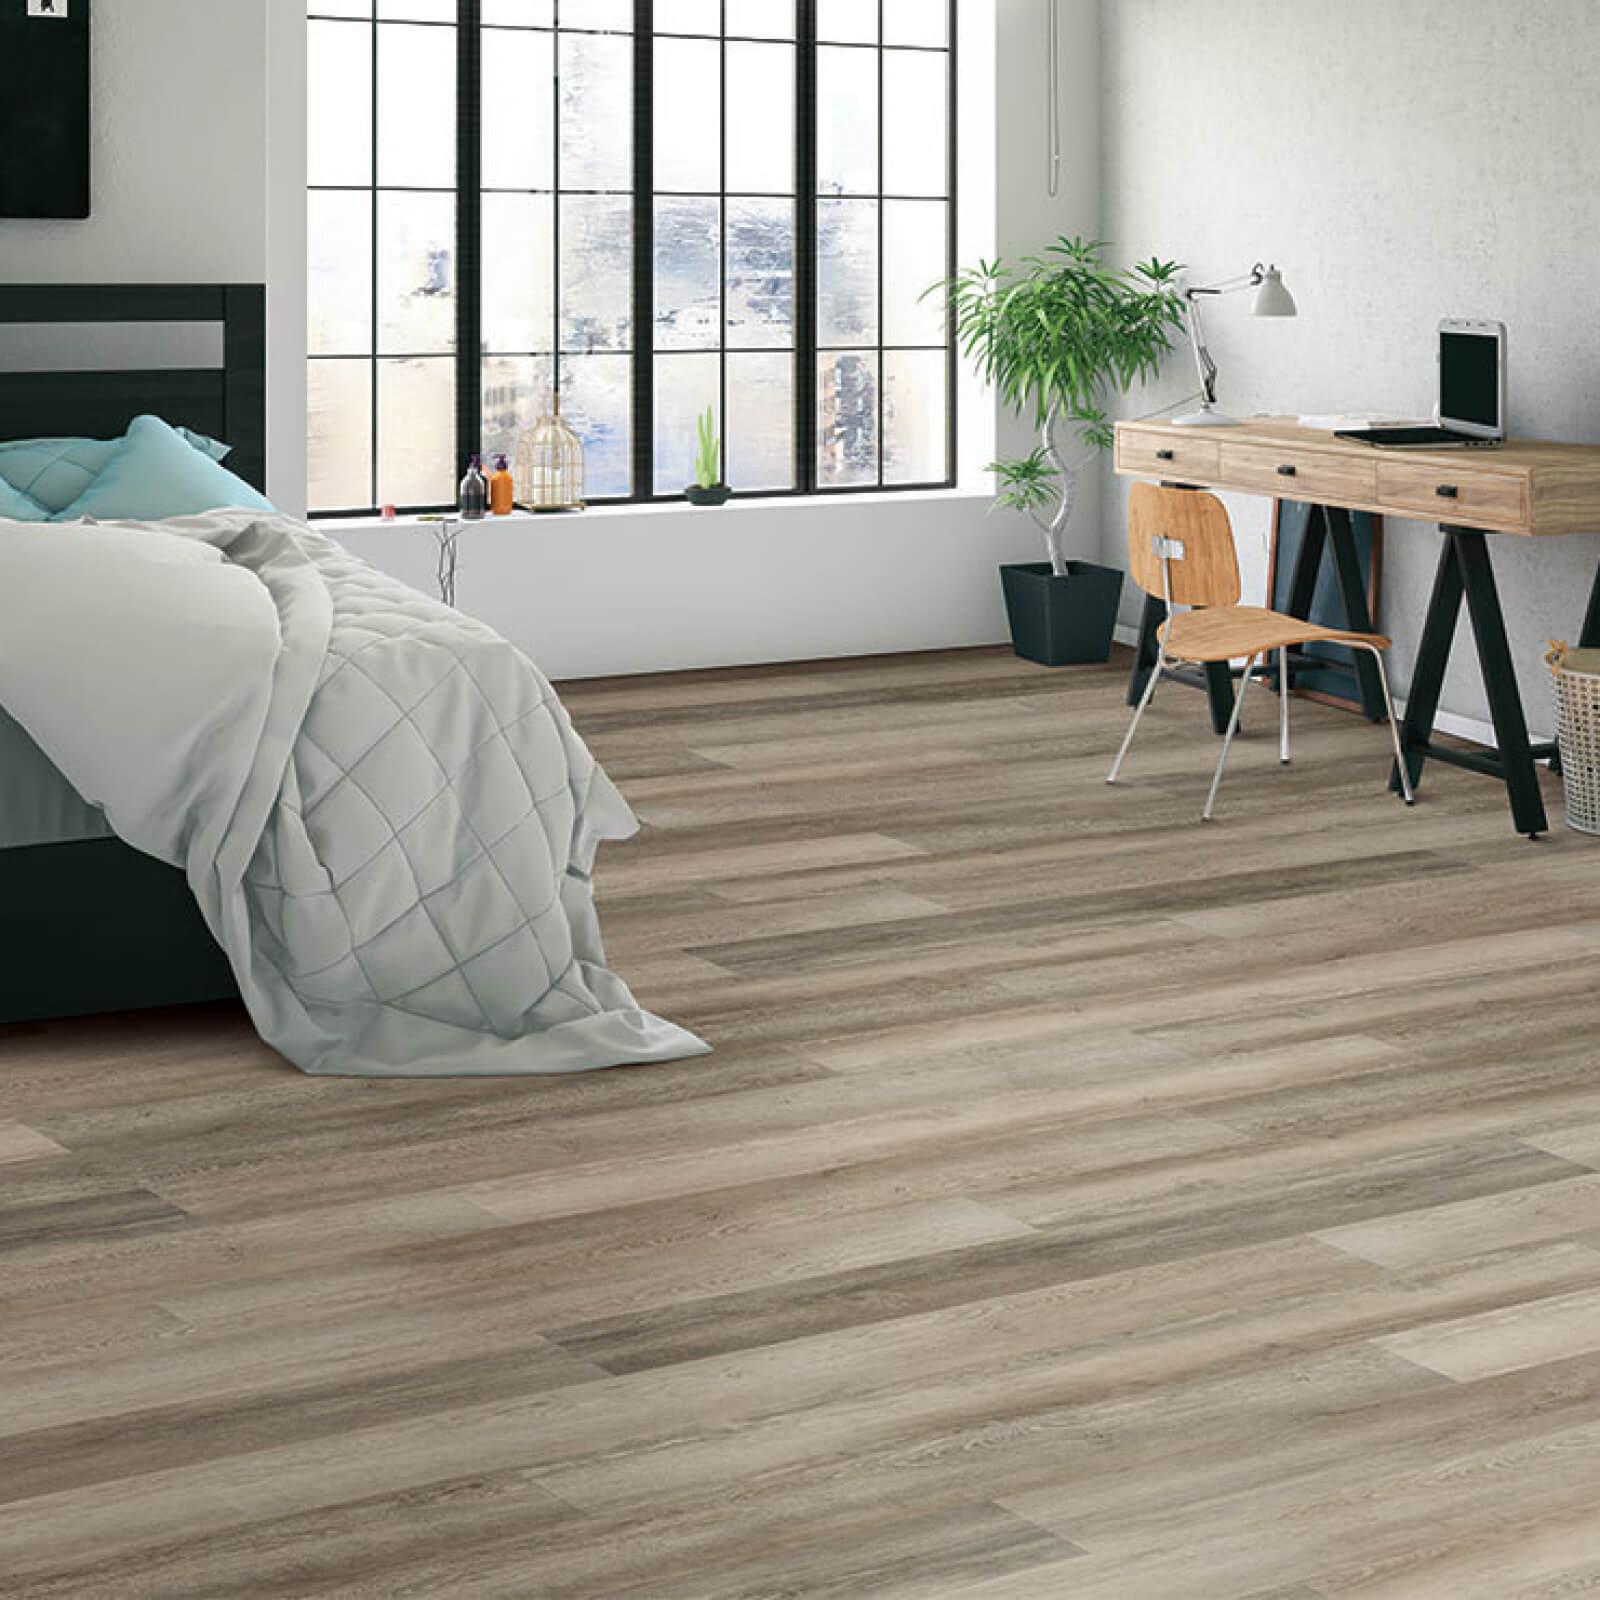 Bedroom flooring | Great Floors